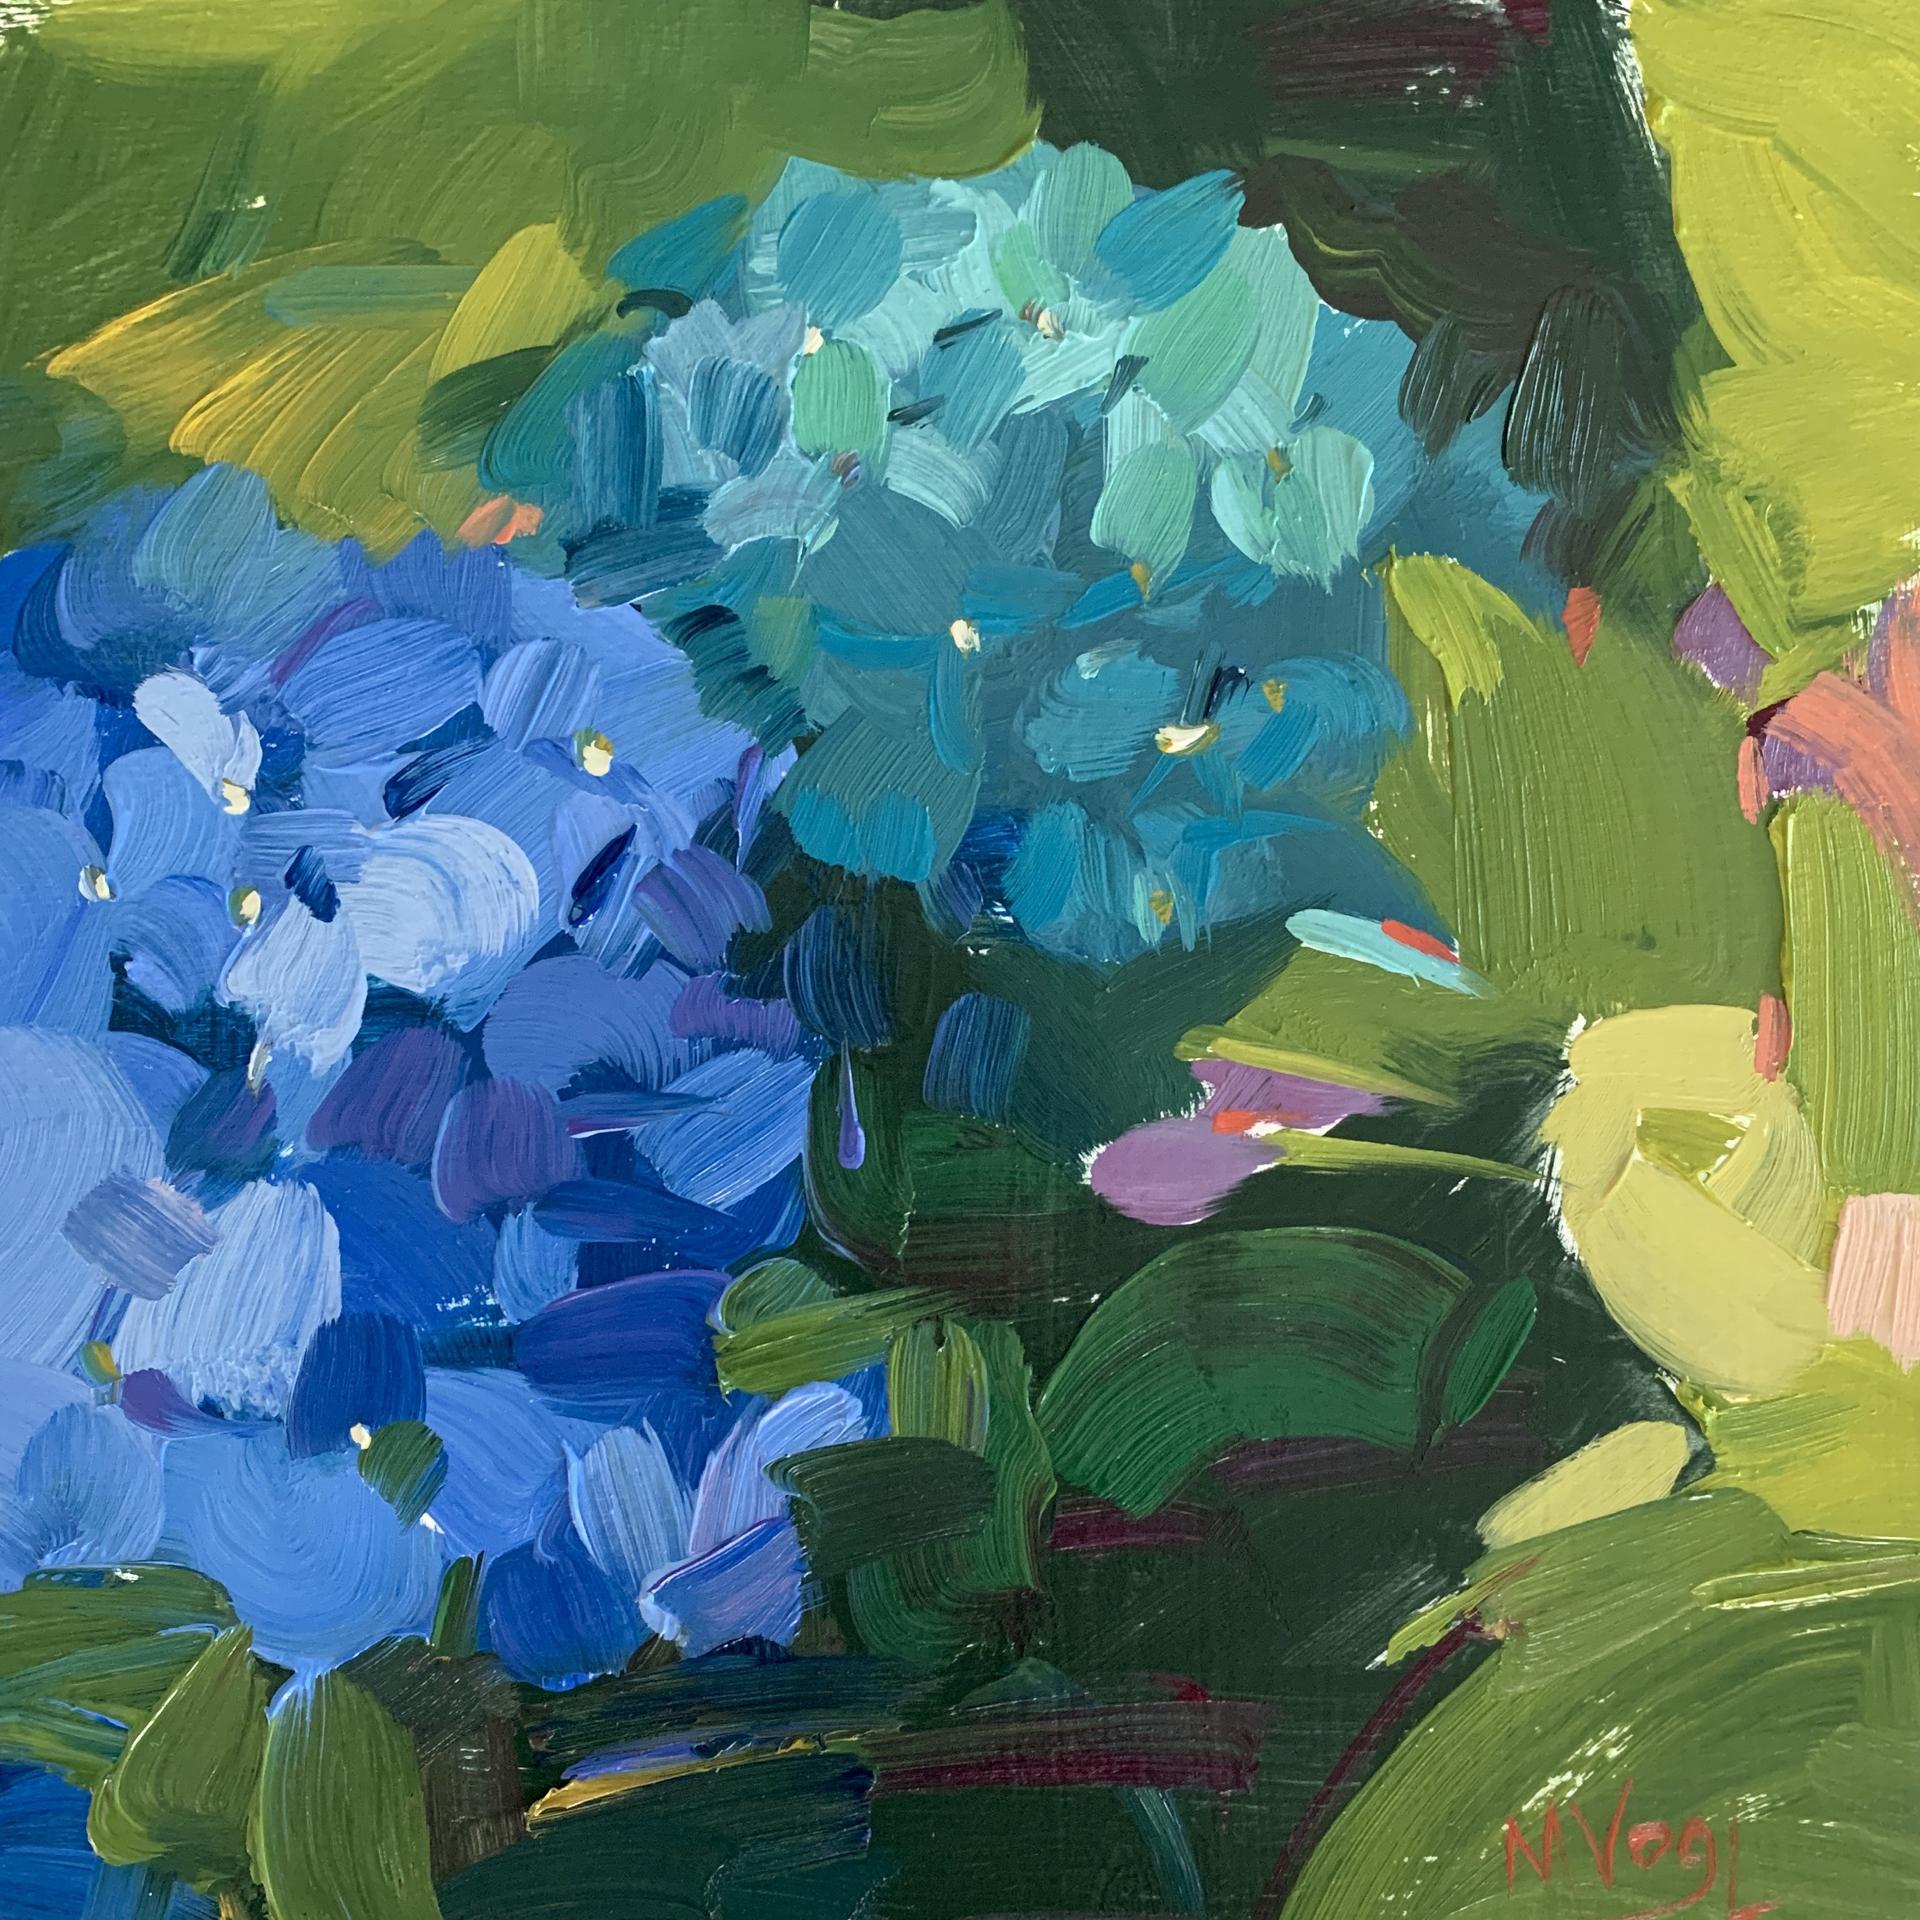 Hydrangea I by Marissa Vogl